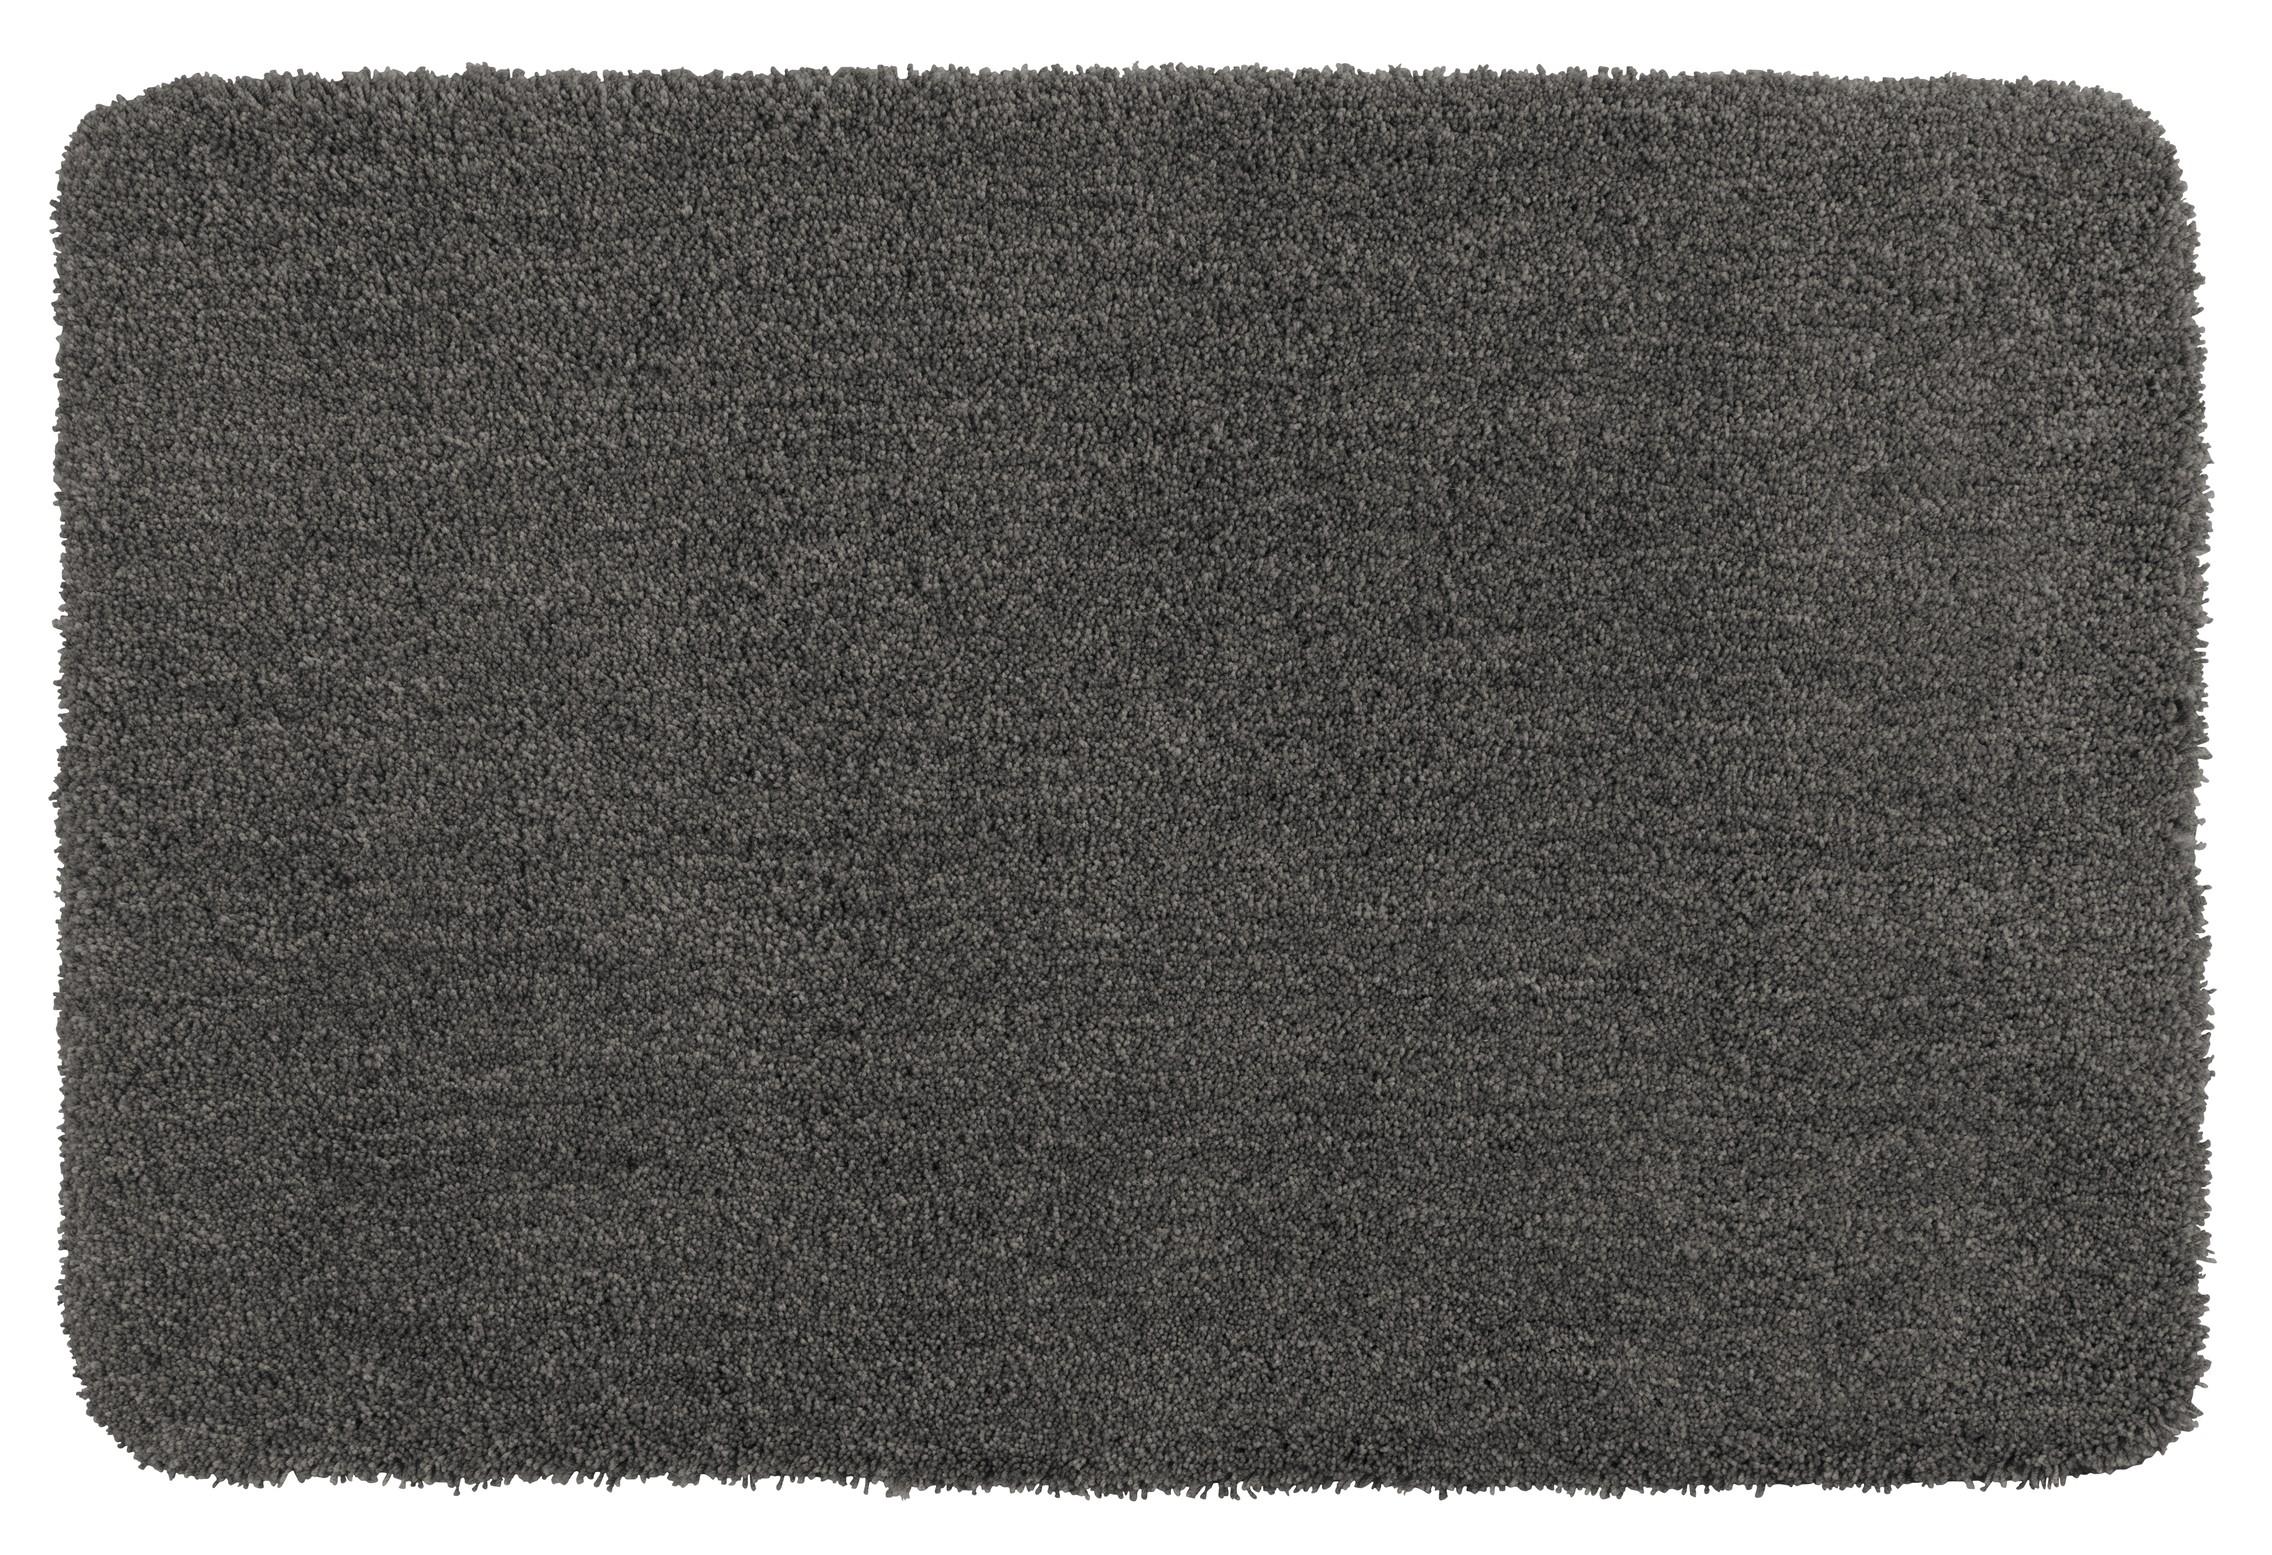 Wenko Badteppich Belize Mouse Grey, 55 x 65 cm, Mikrofaser